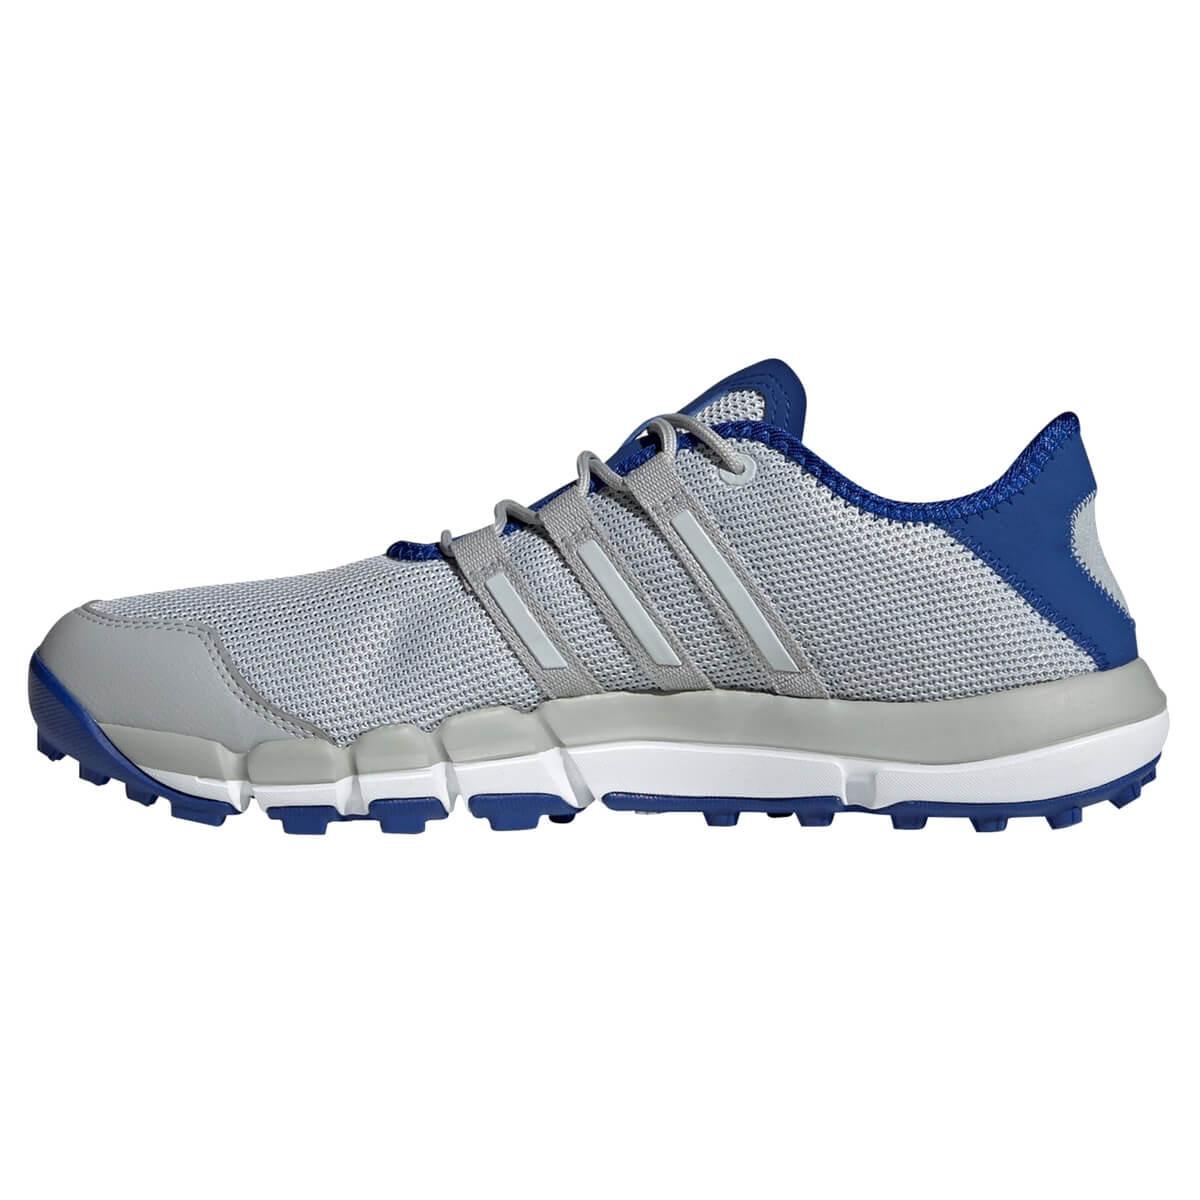 adidas climacool golf shoes mens off 52% - www.usushimd.com